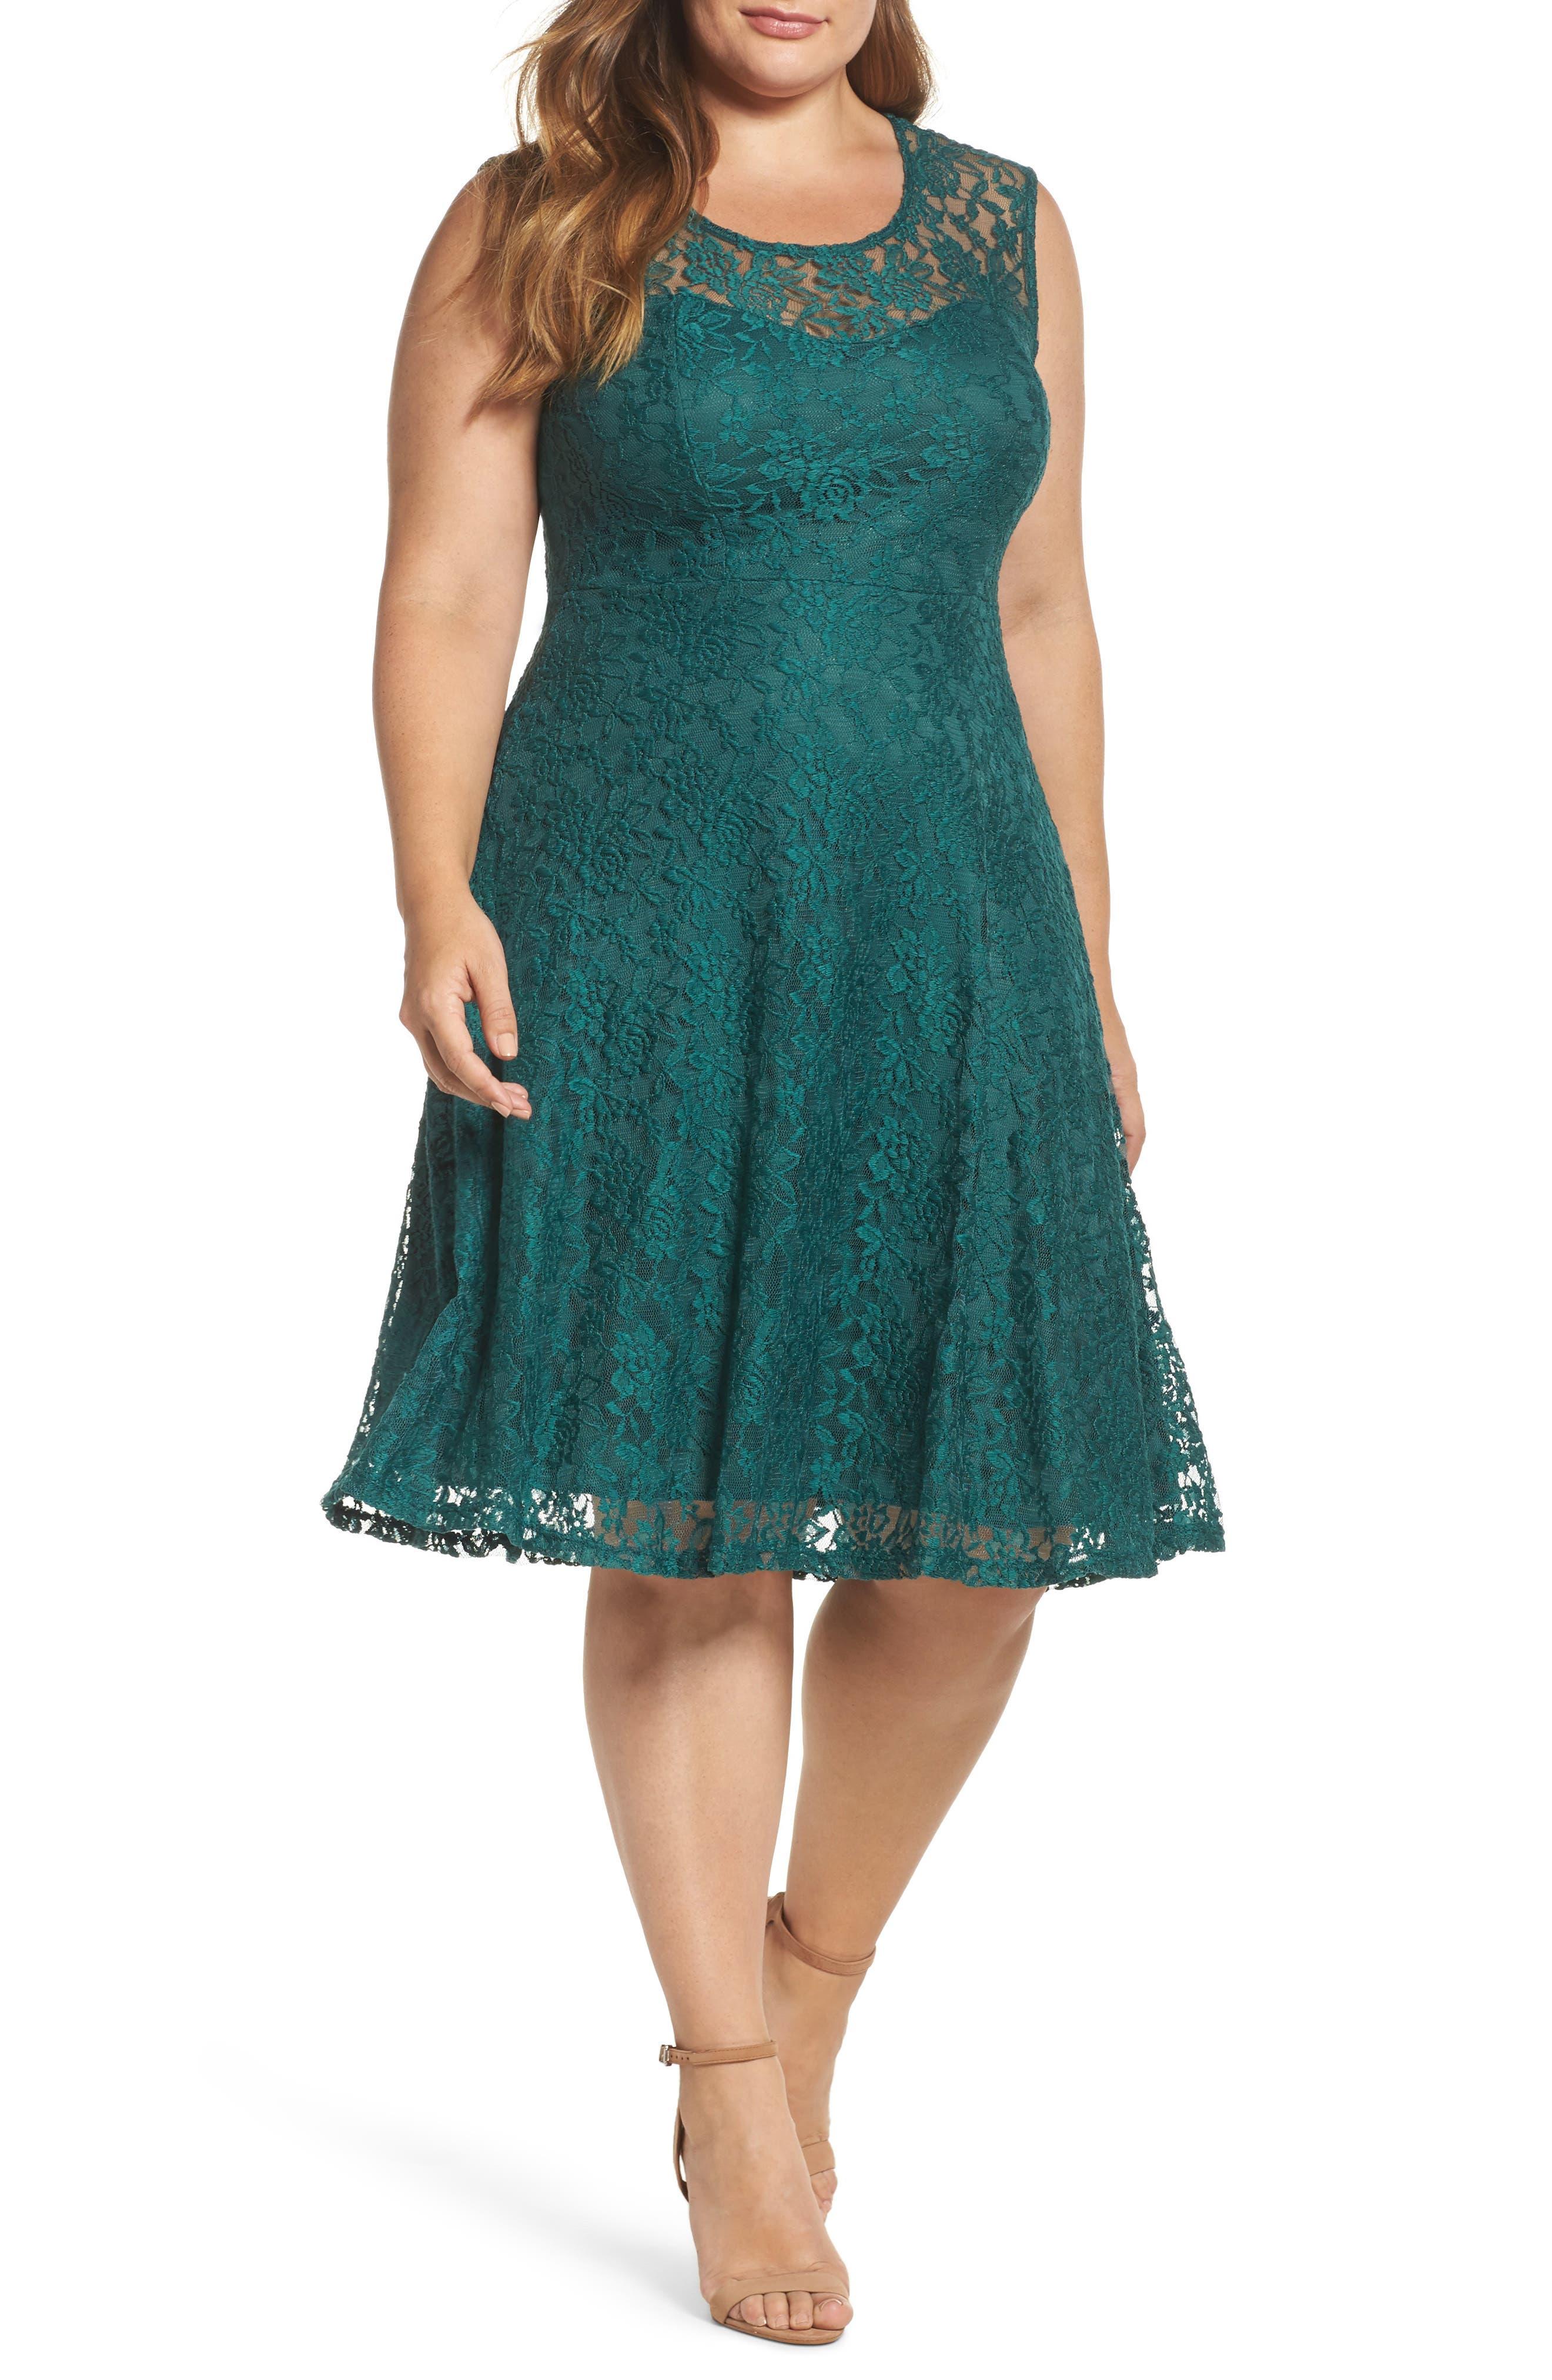 Alternate Image 1 Selected - Soprano Lace Skater Dress